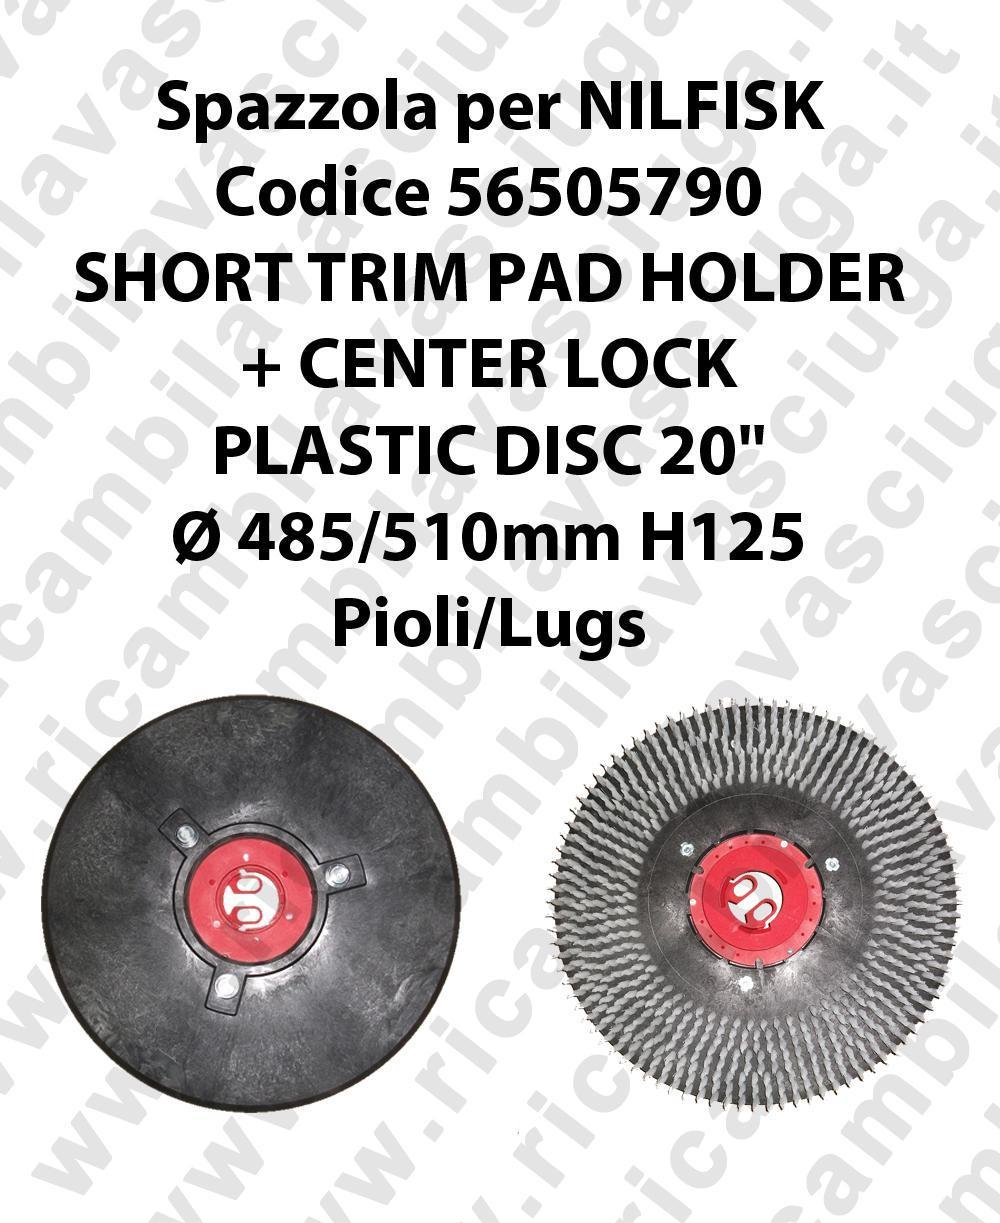 SHORT TRIM PAD HOLDER + CENTERLOCK para fregadora NILFISK codice 56505790